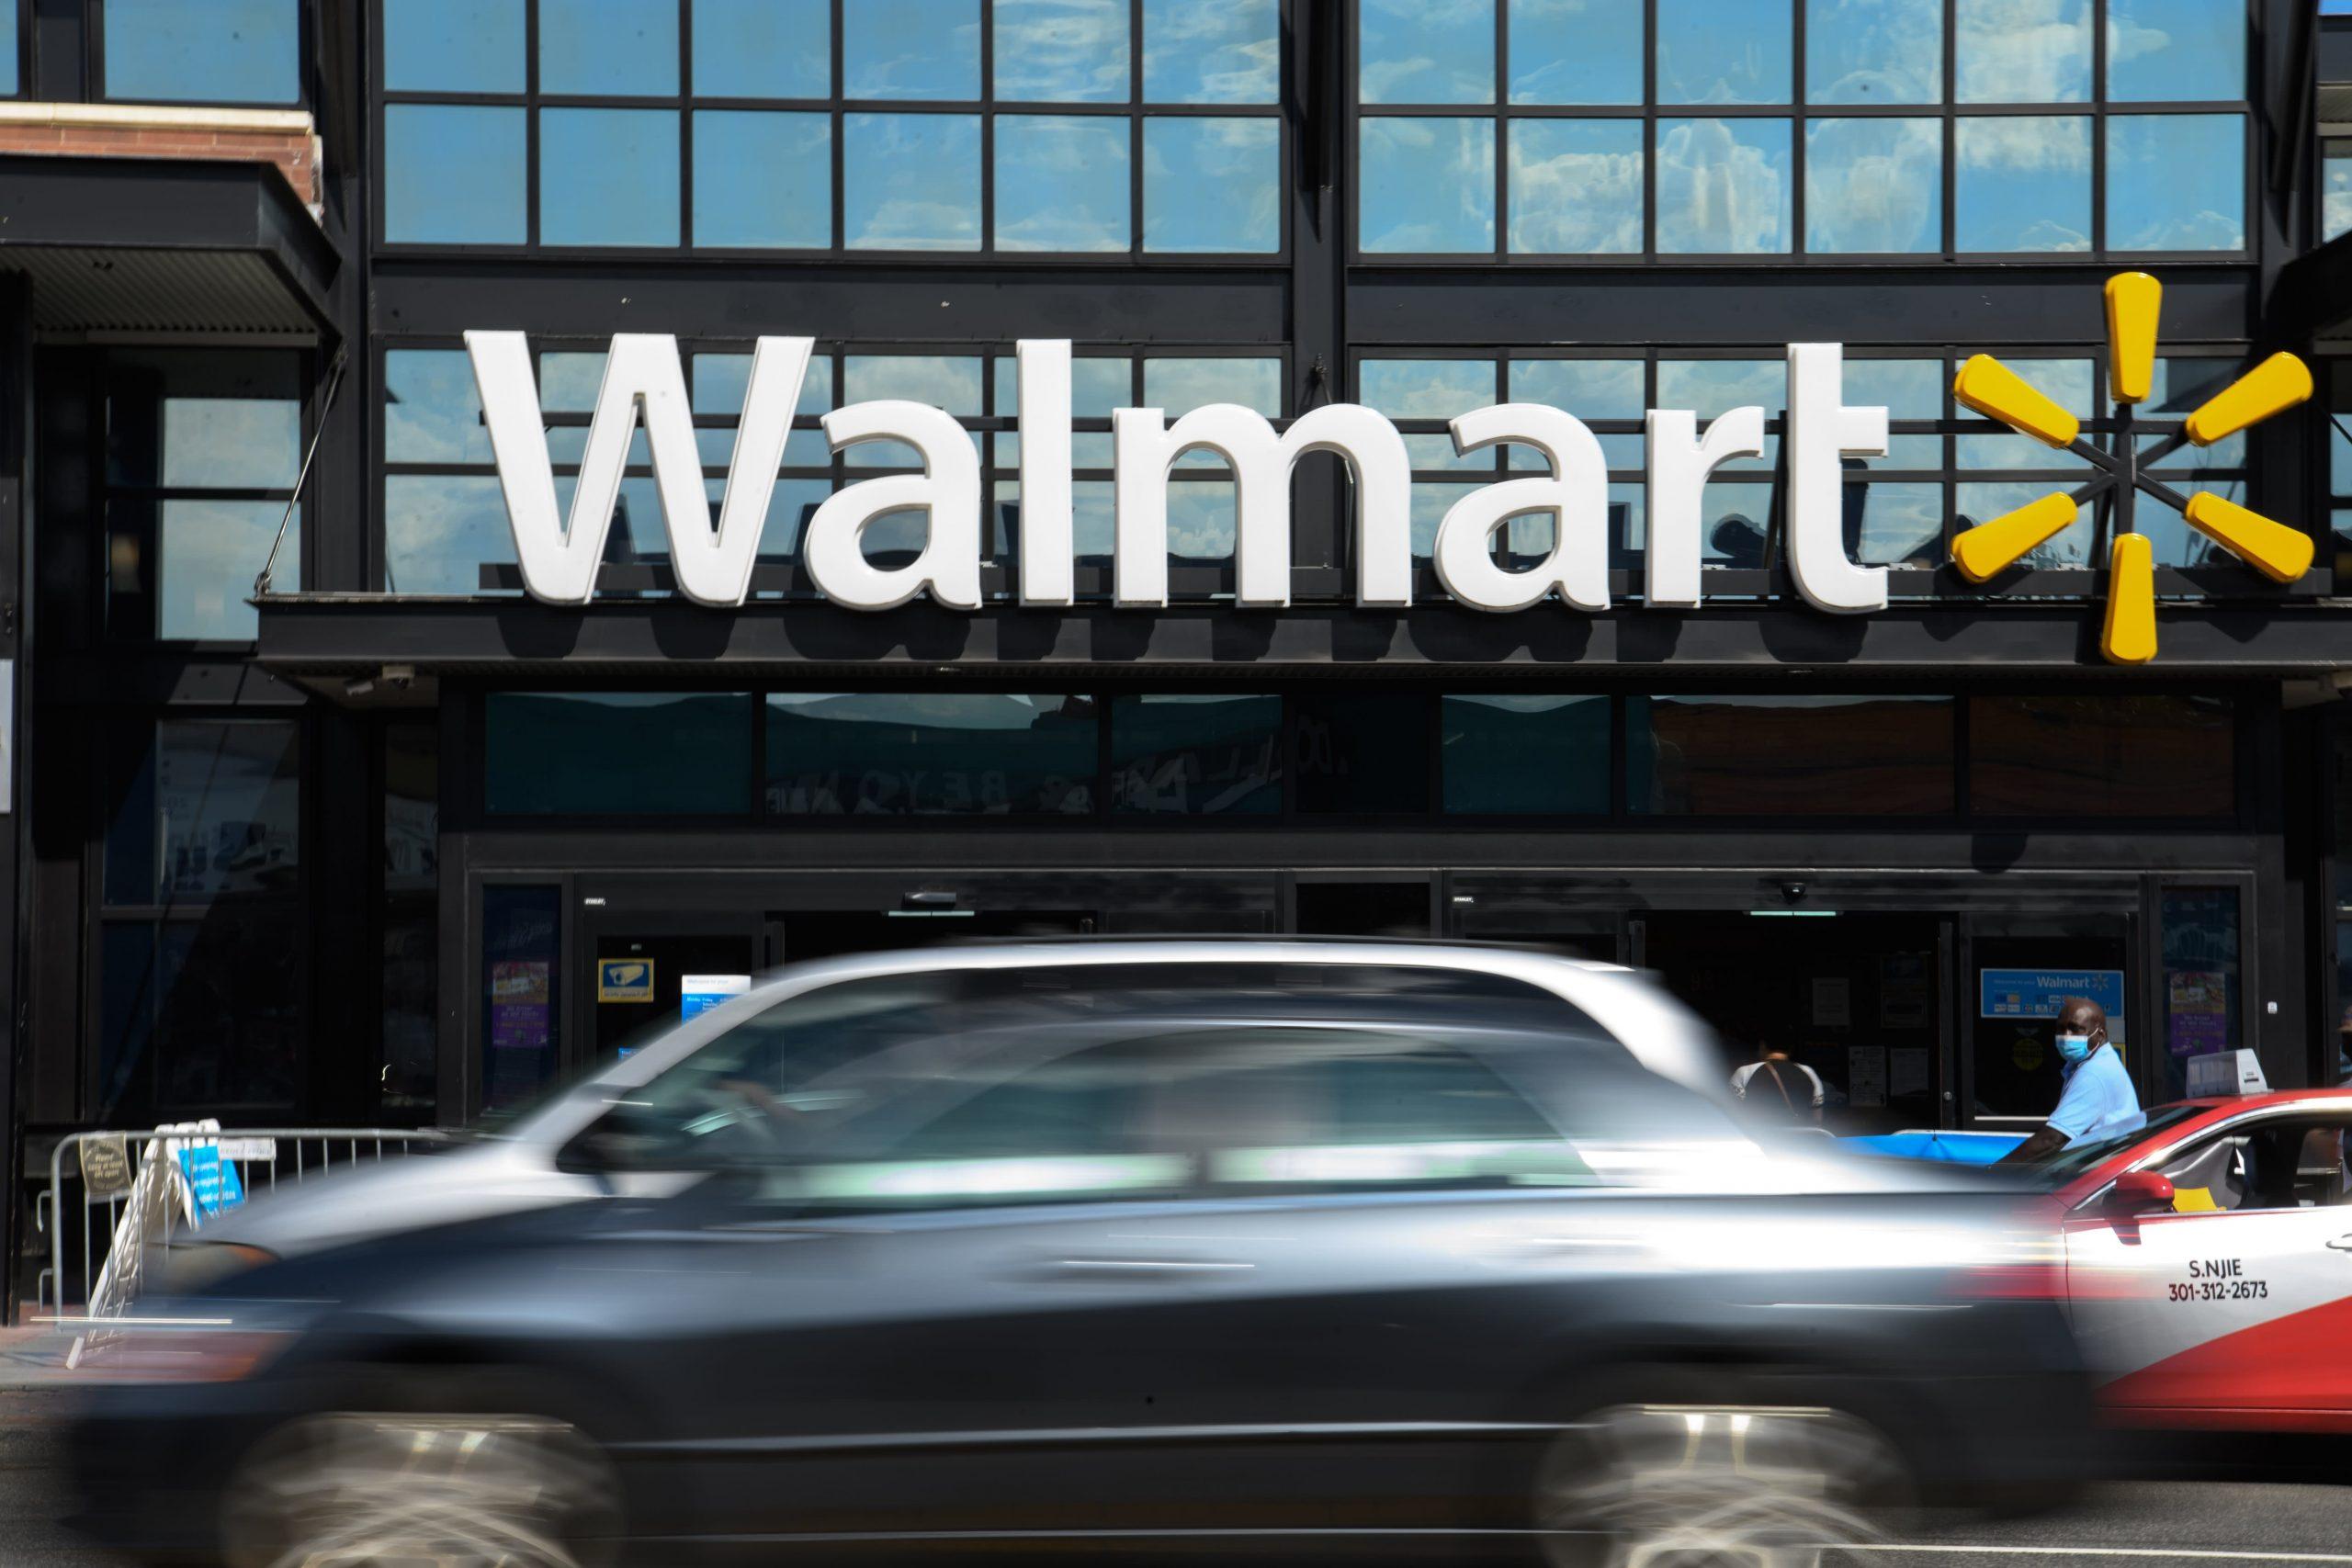 walmart-to-create-fintech-start-up-with-investment-firm-behind-robinhood